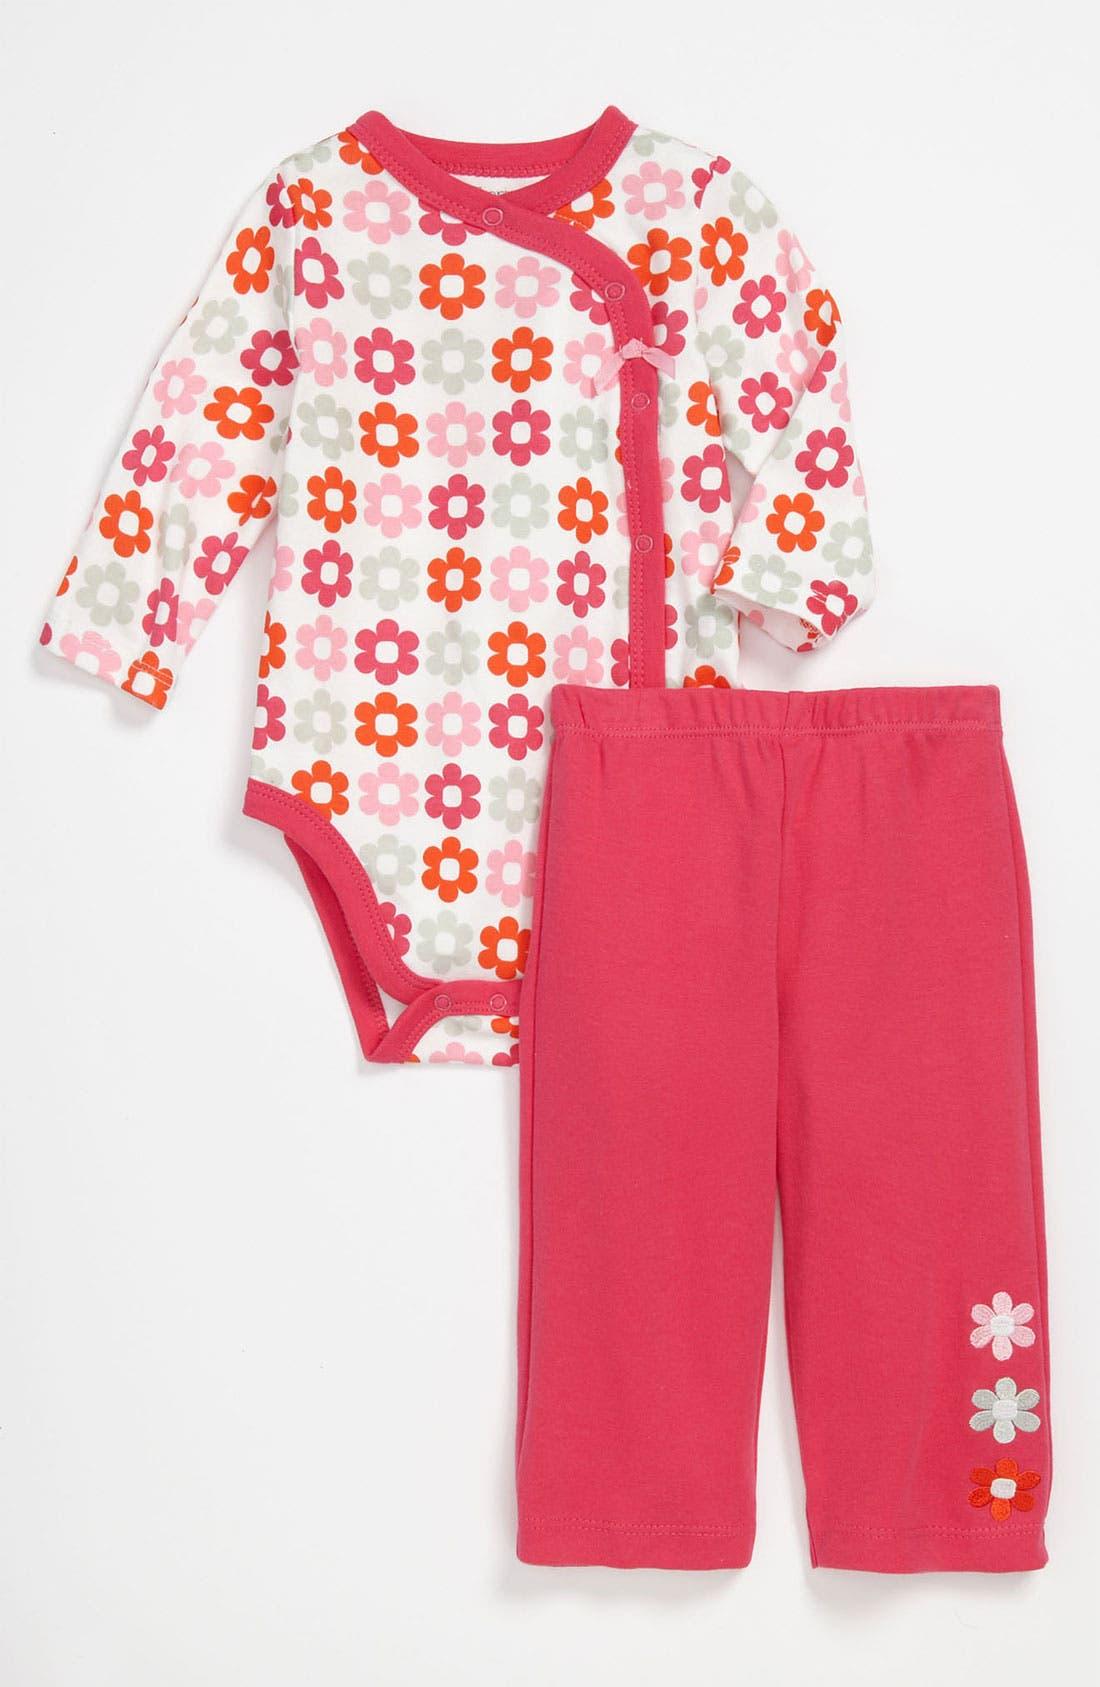 Alternate Image 1 Selected - Offspring 'Daisy' Bodysuit & Pants (Infant)